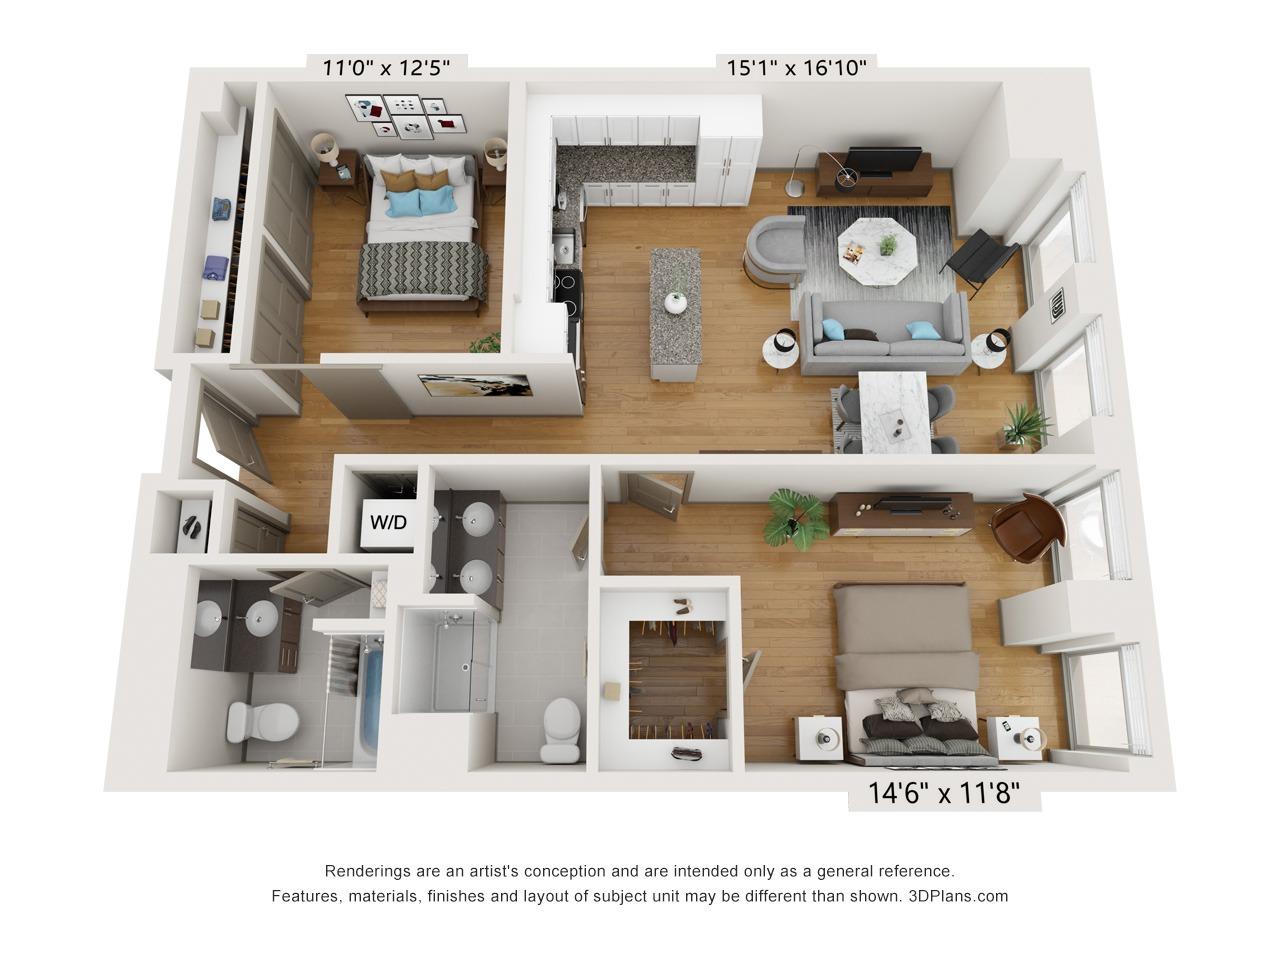 B2C - 2 Bed 2 Bath - 1,117 SF